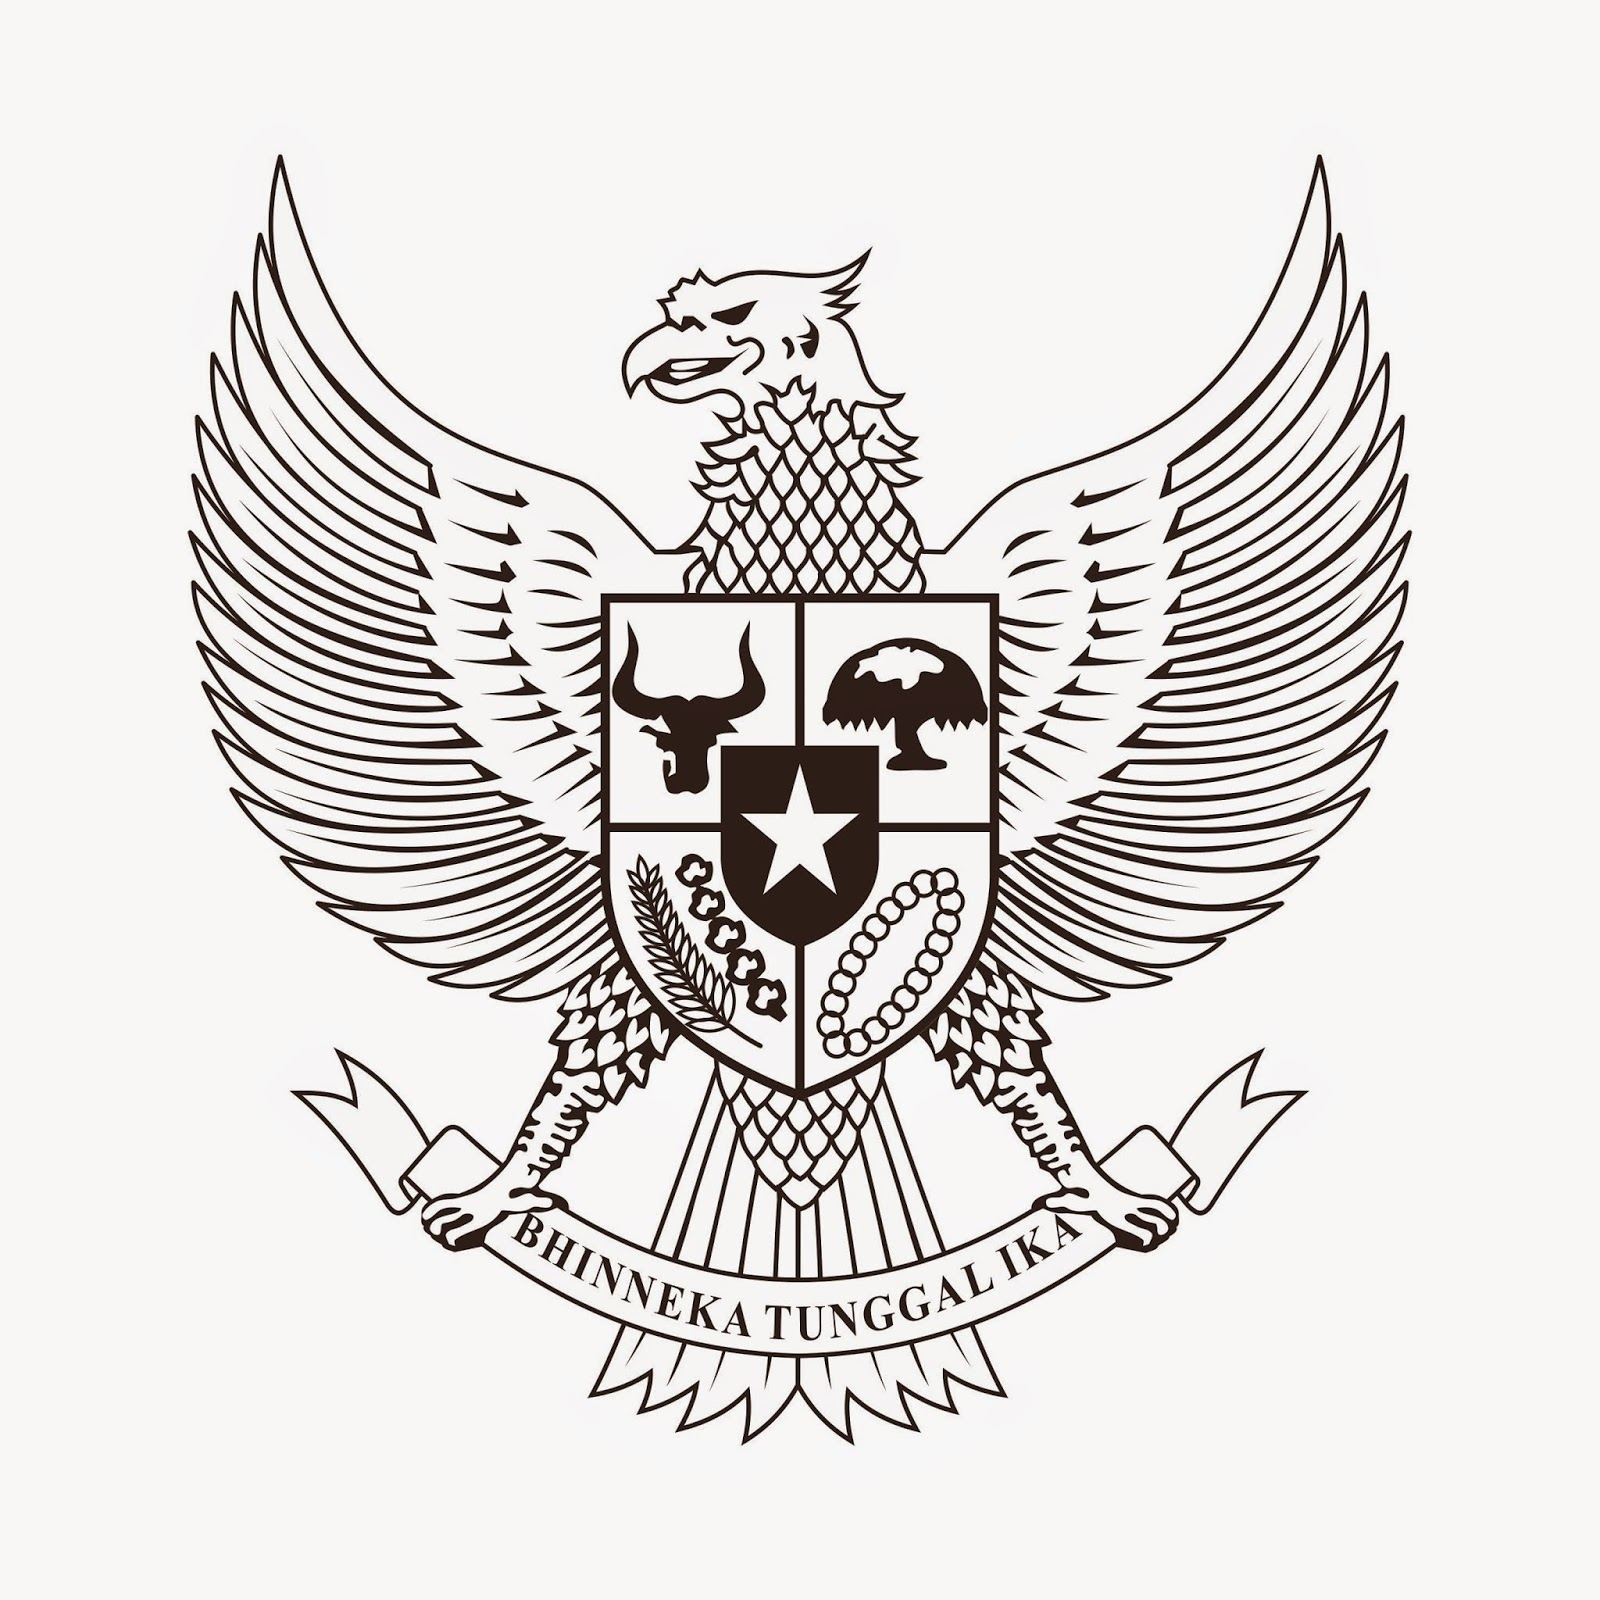 first image of Gambar Burung Garuda Pancasila Untuk Mewarnai with Mewarnai Lambang Pancasila - Warna Key